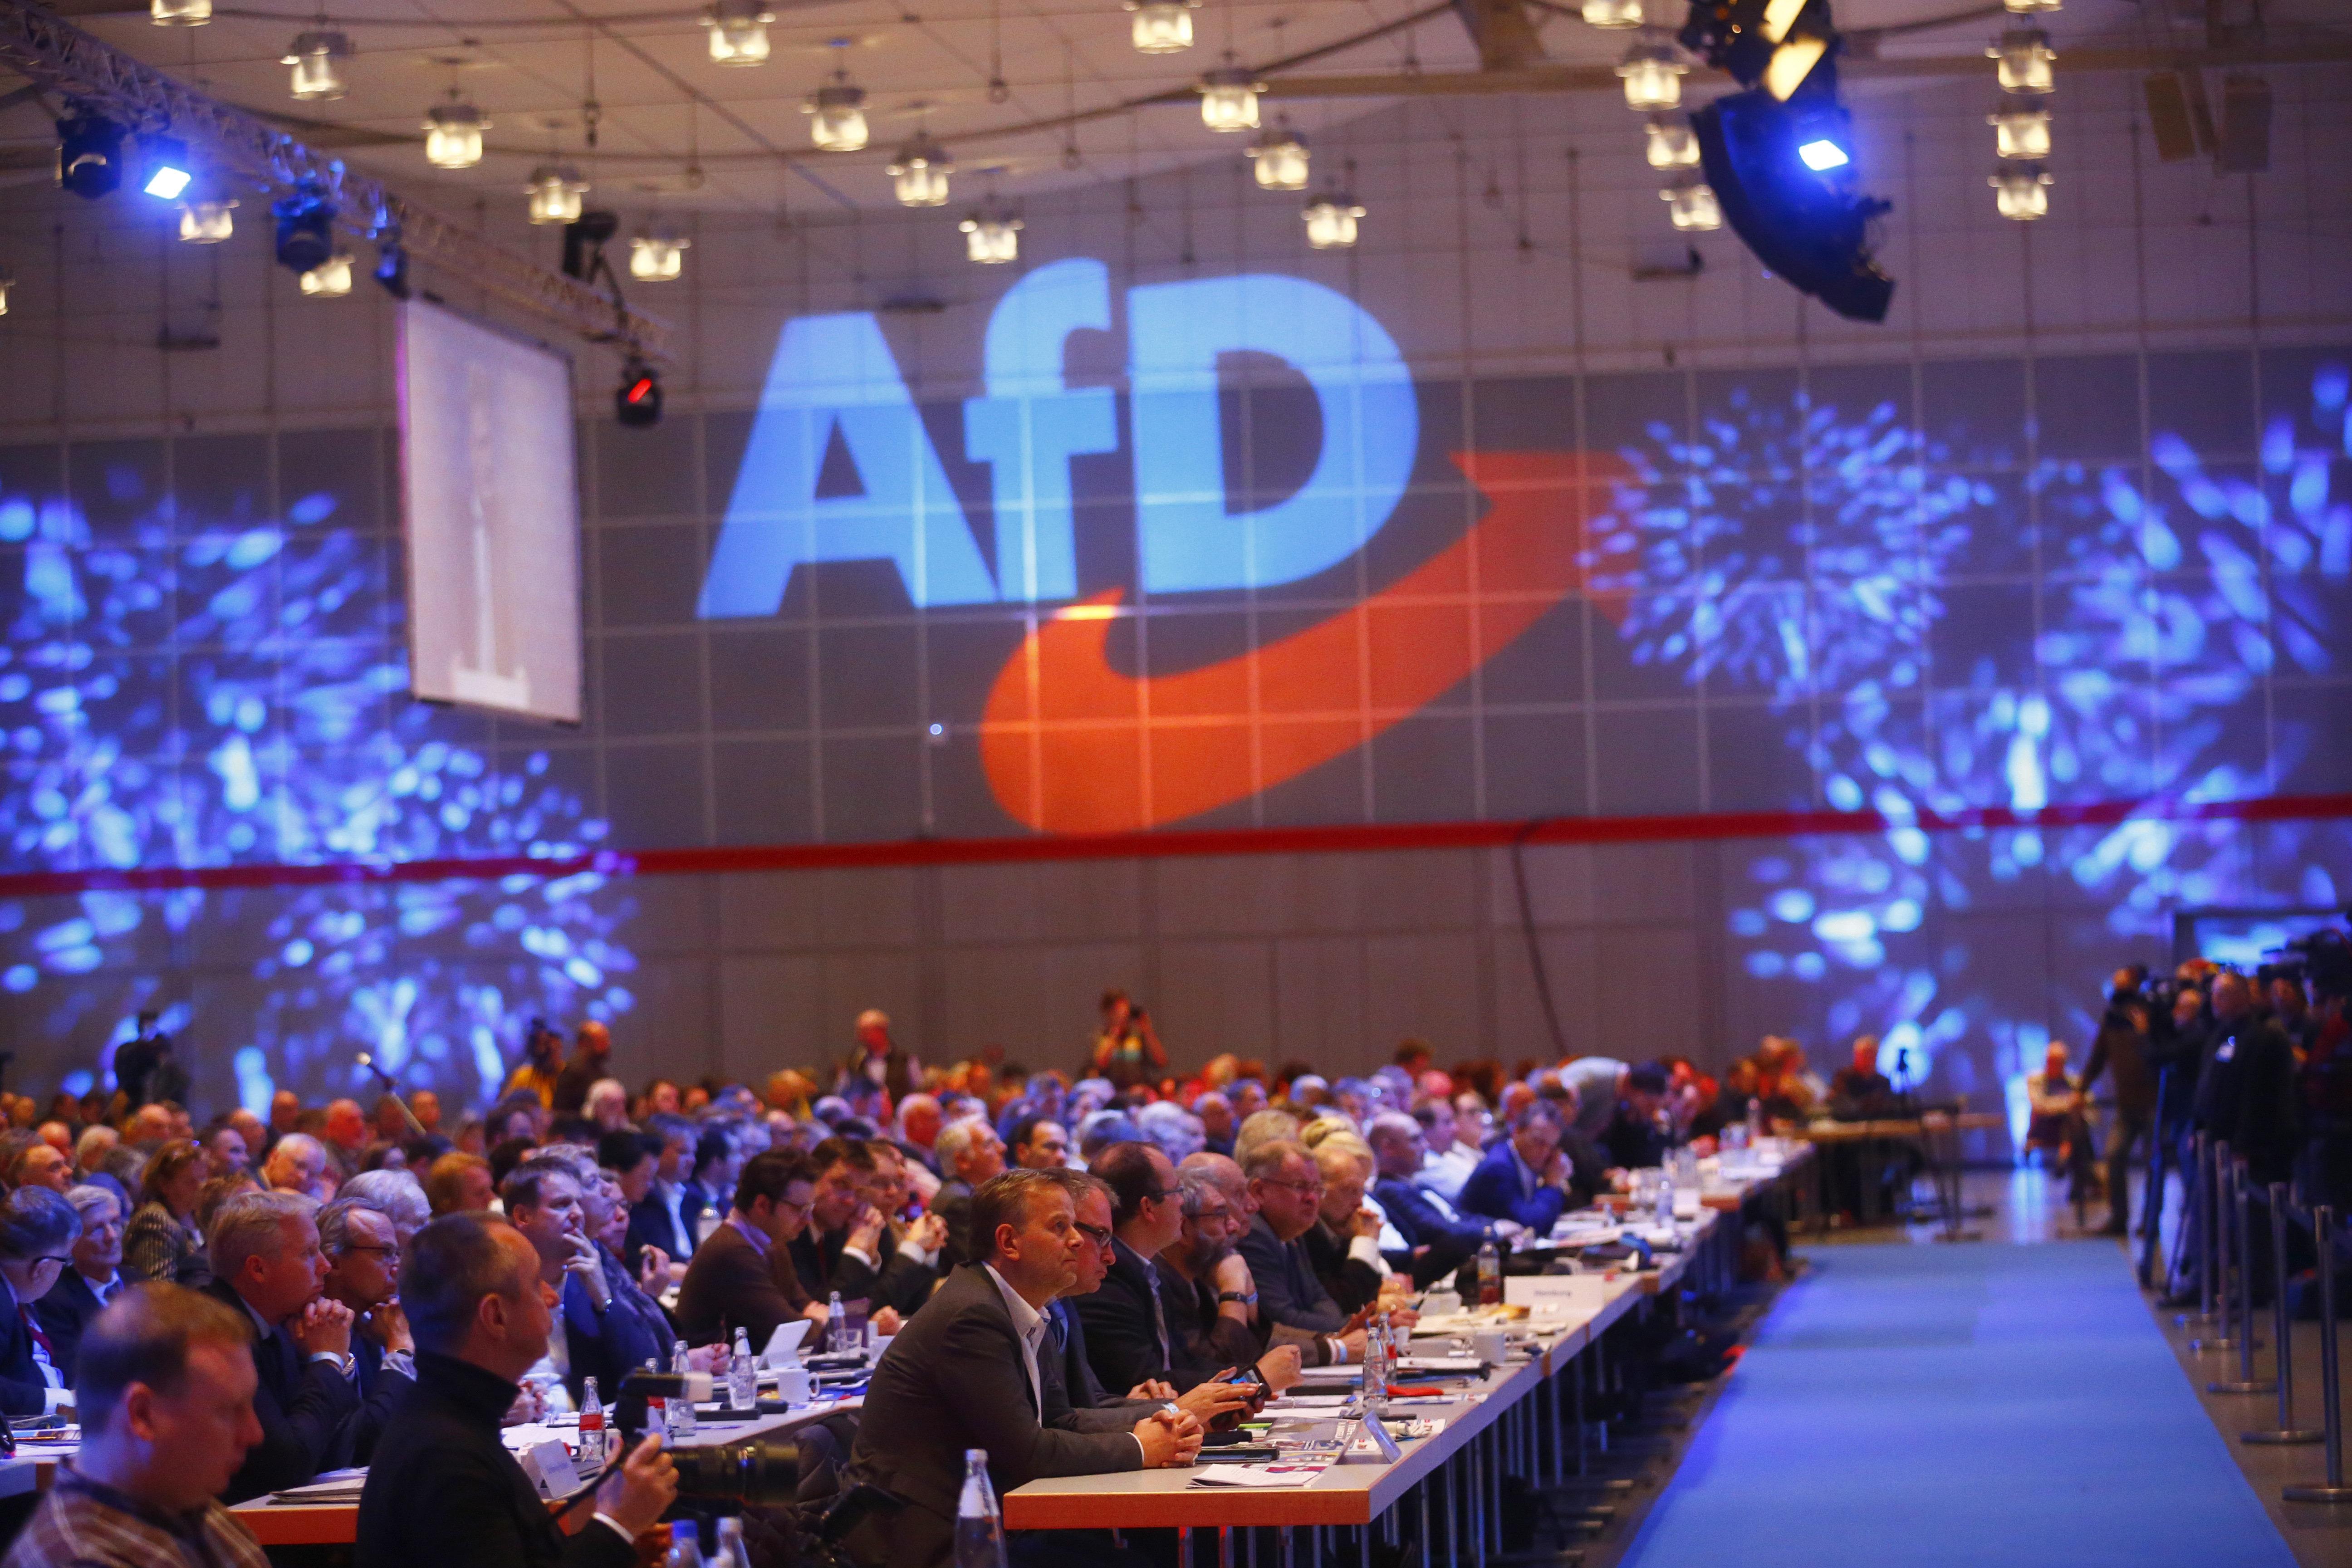 H γερμανική ακροδεξιά και τα μέσα κοινωνικής δικτύωσης. Πώς το AfD κατάφερε να κυριαρχήσει σε Facebook...